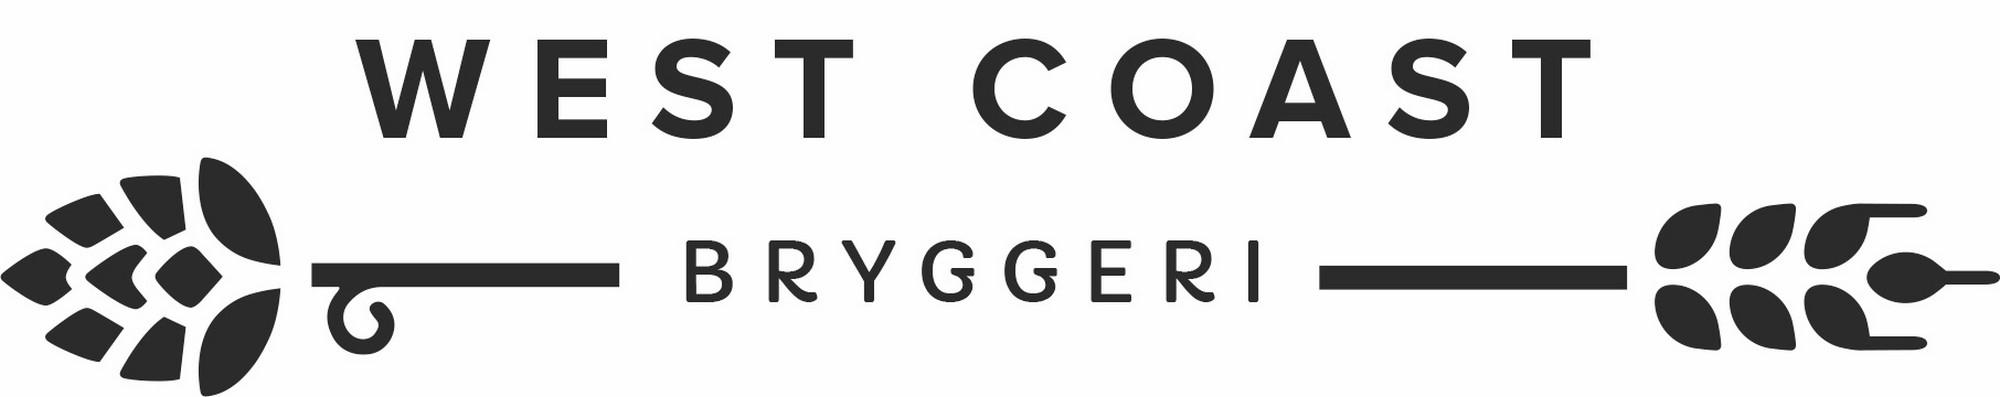 West Coast Bryggeri